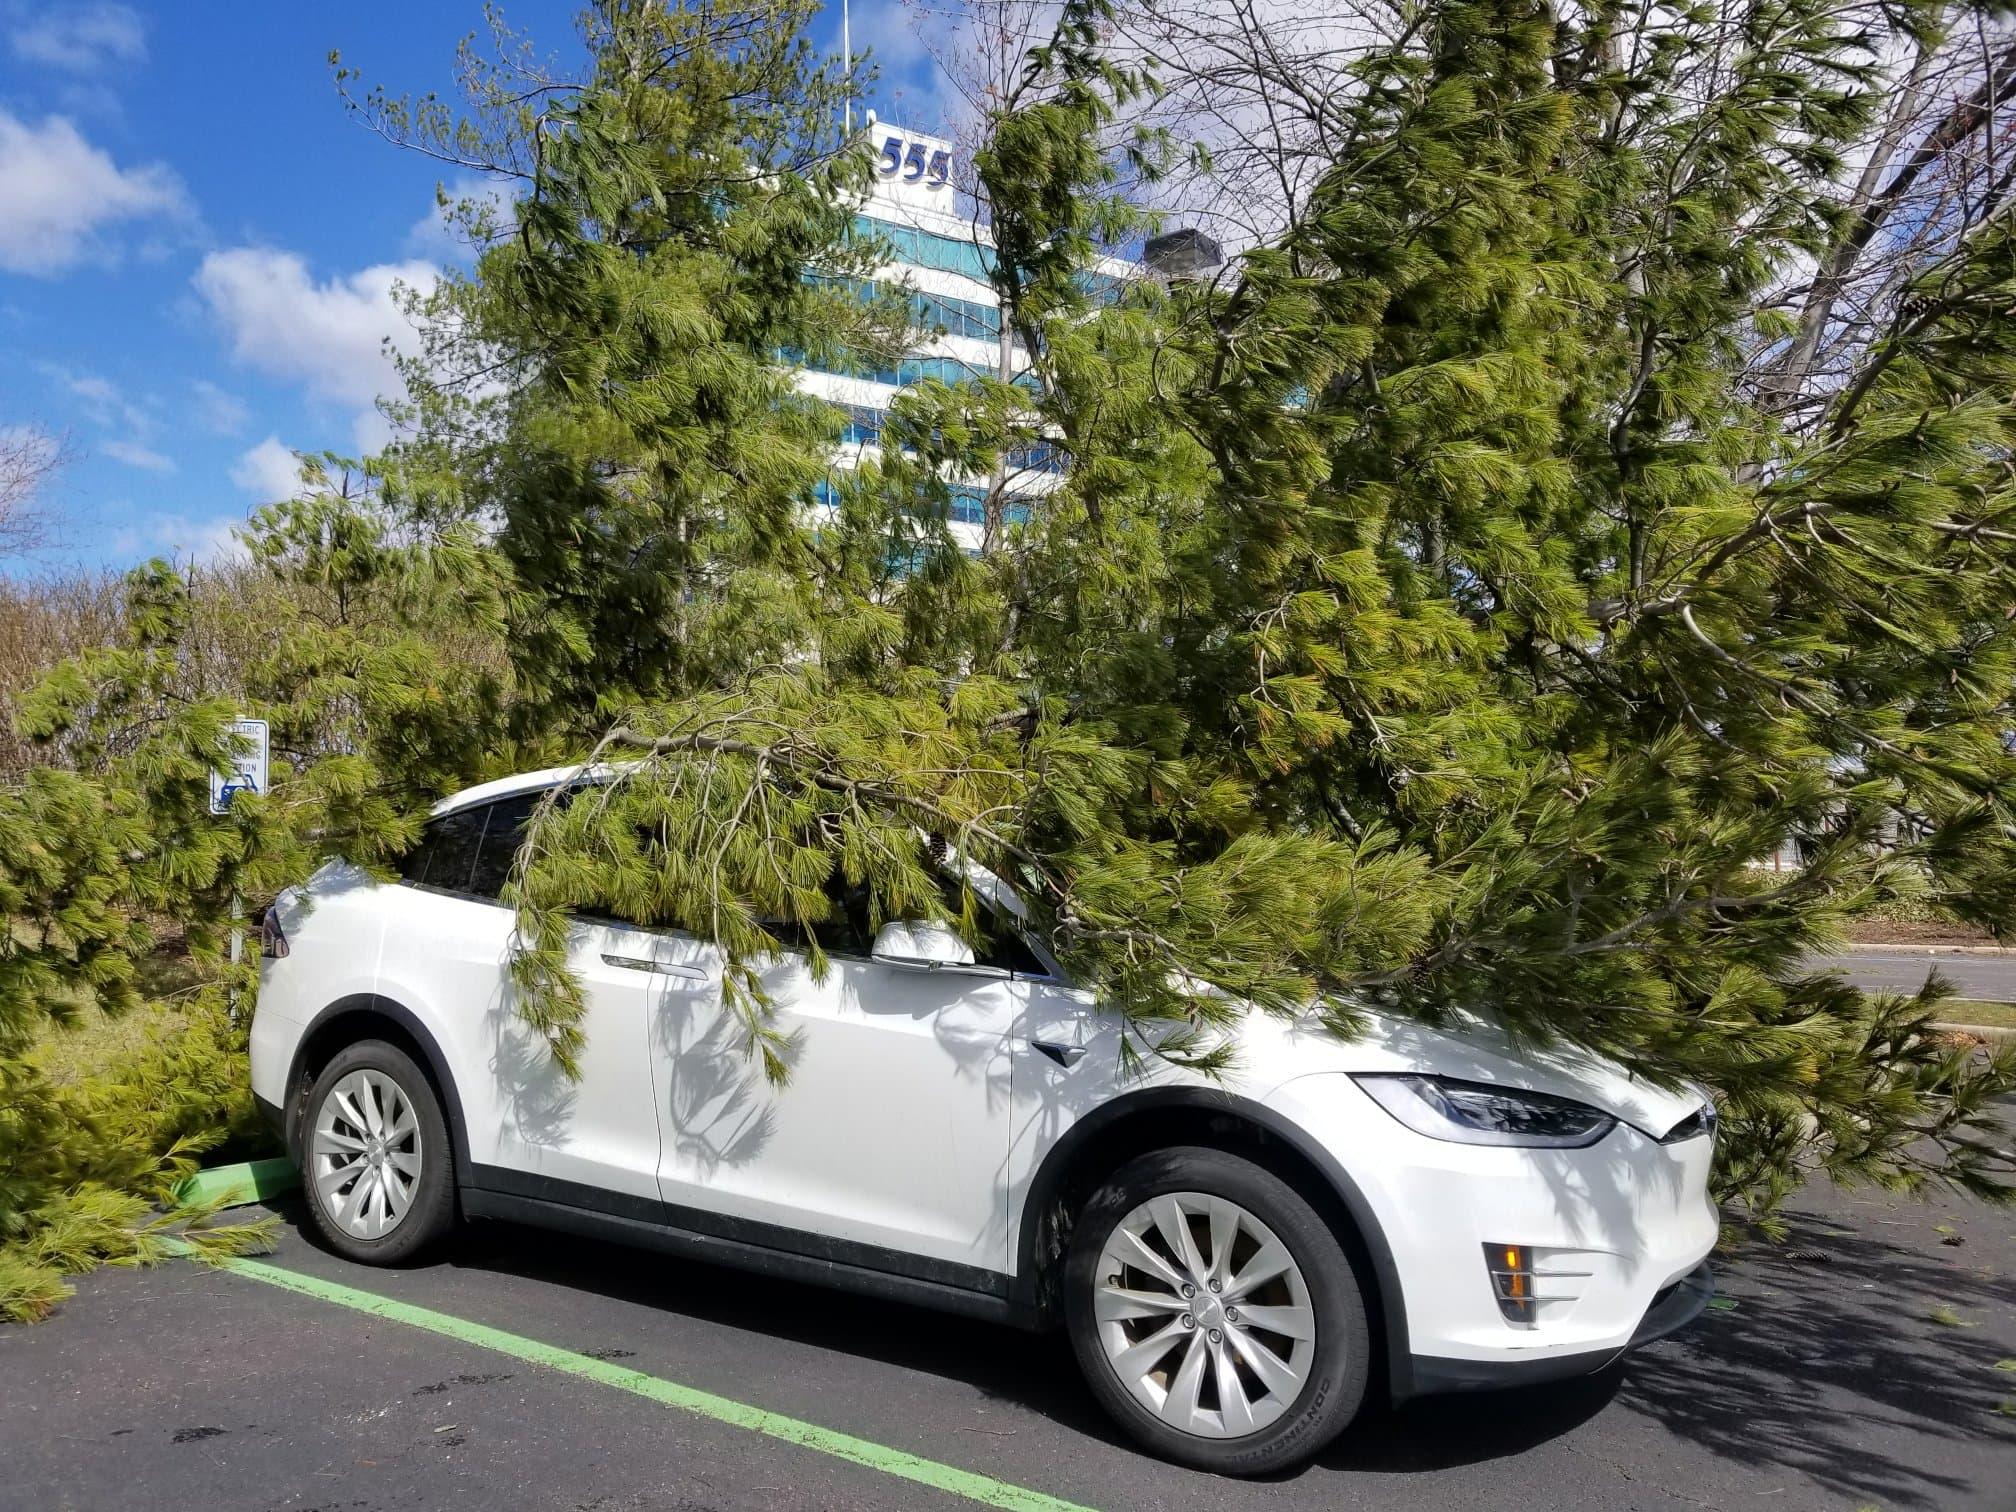 tesla-model-x-tree-fall-roof